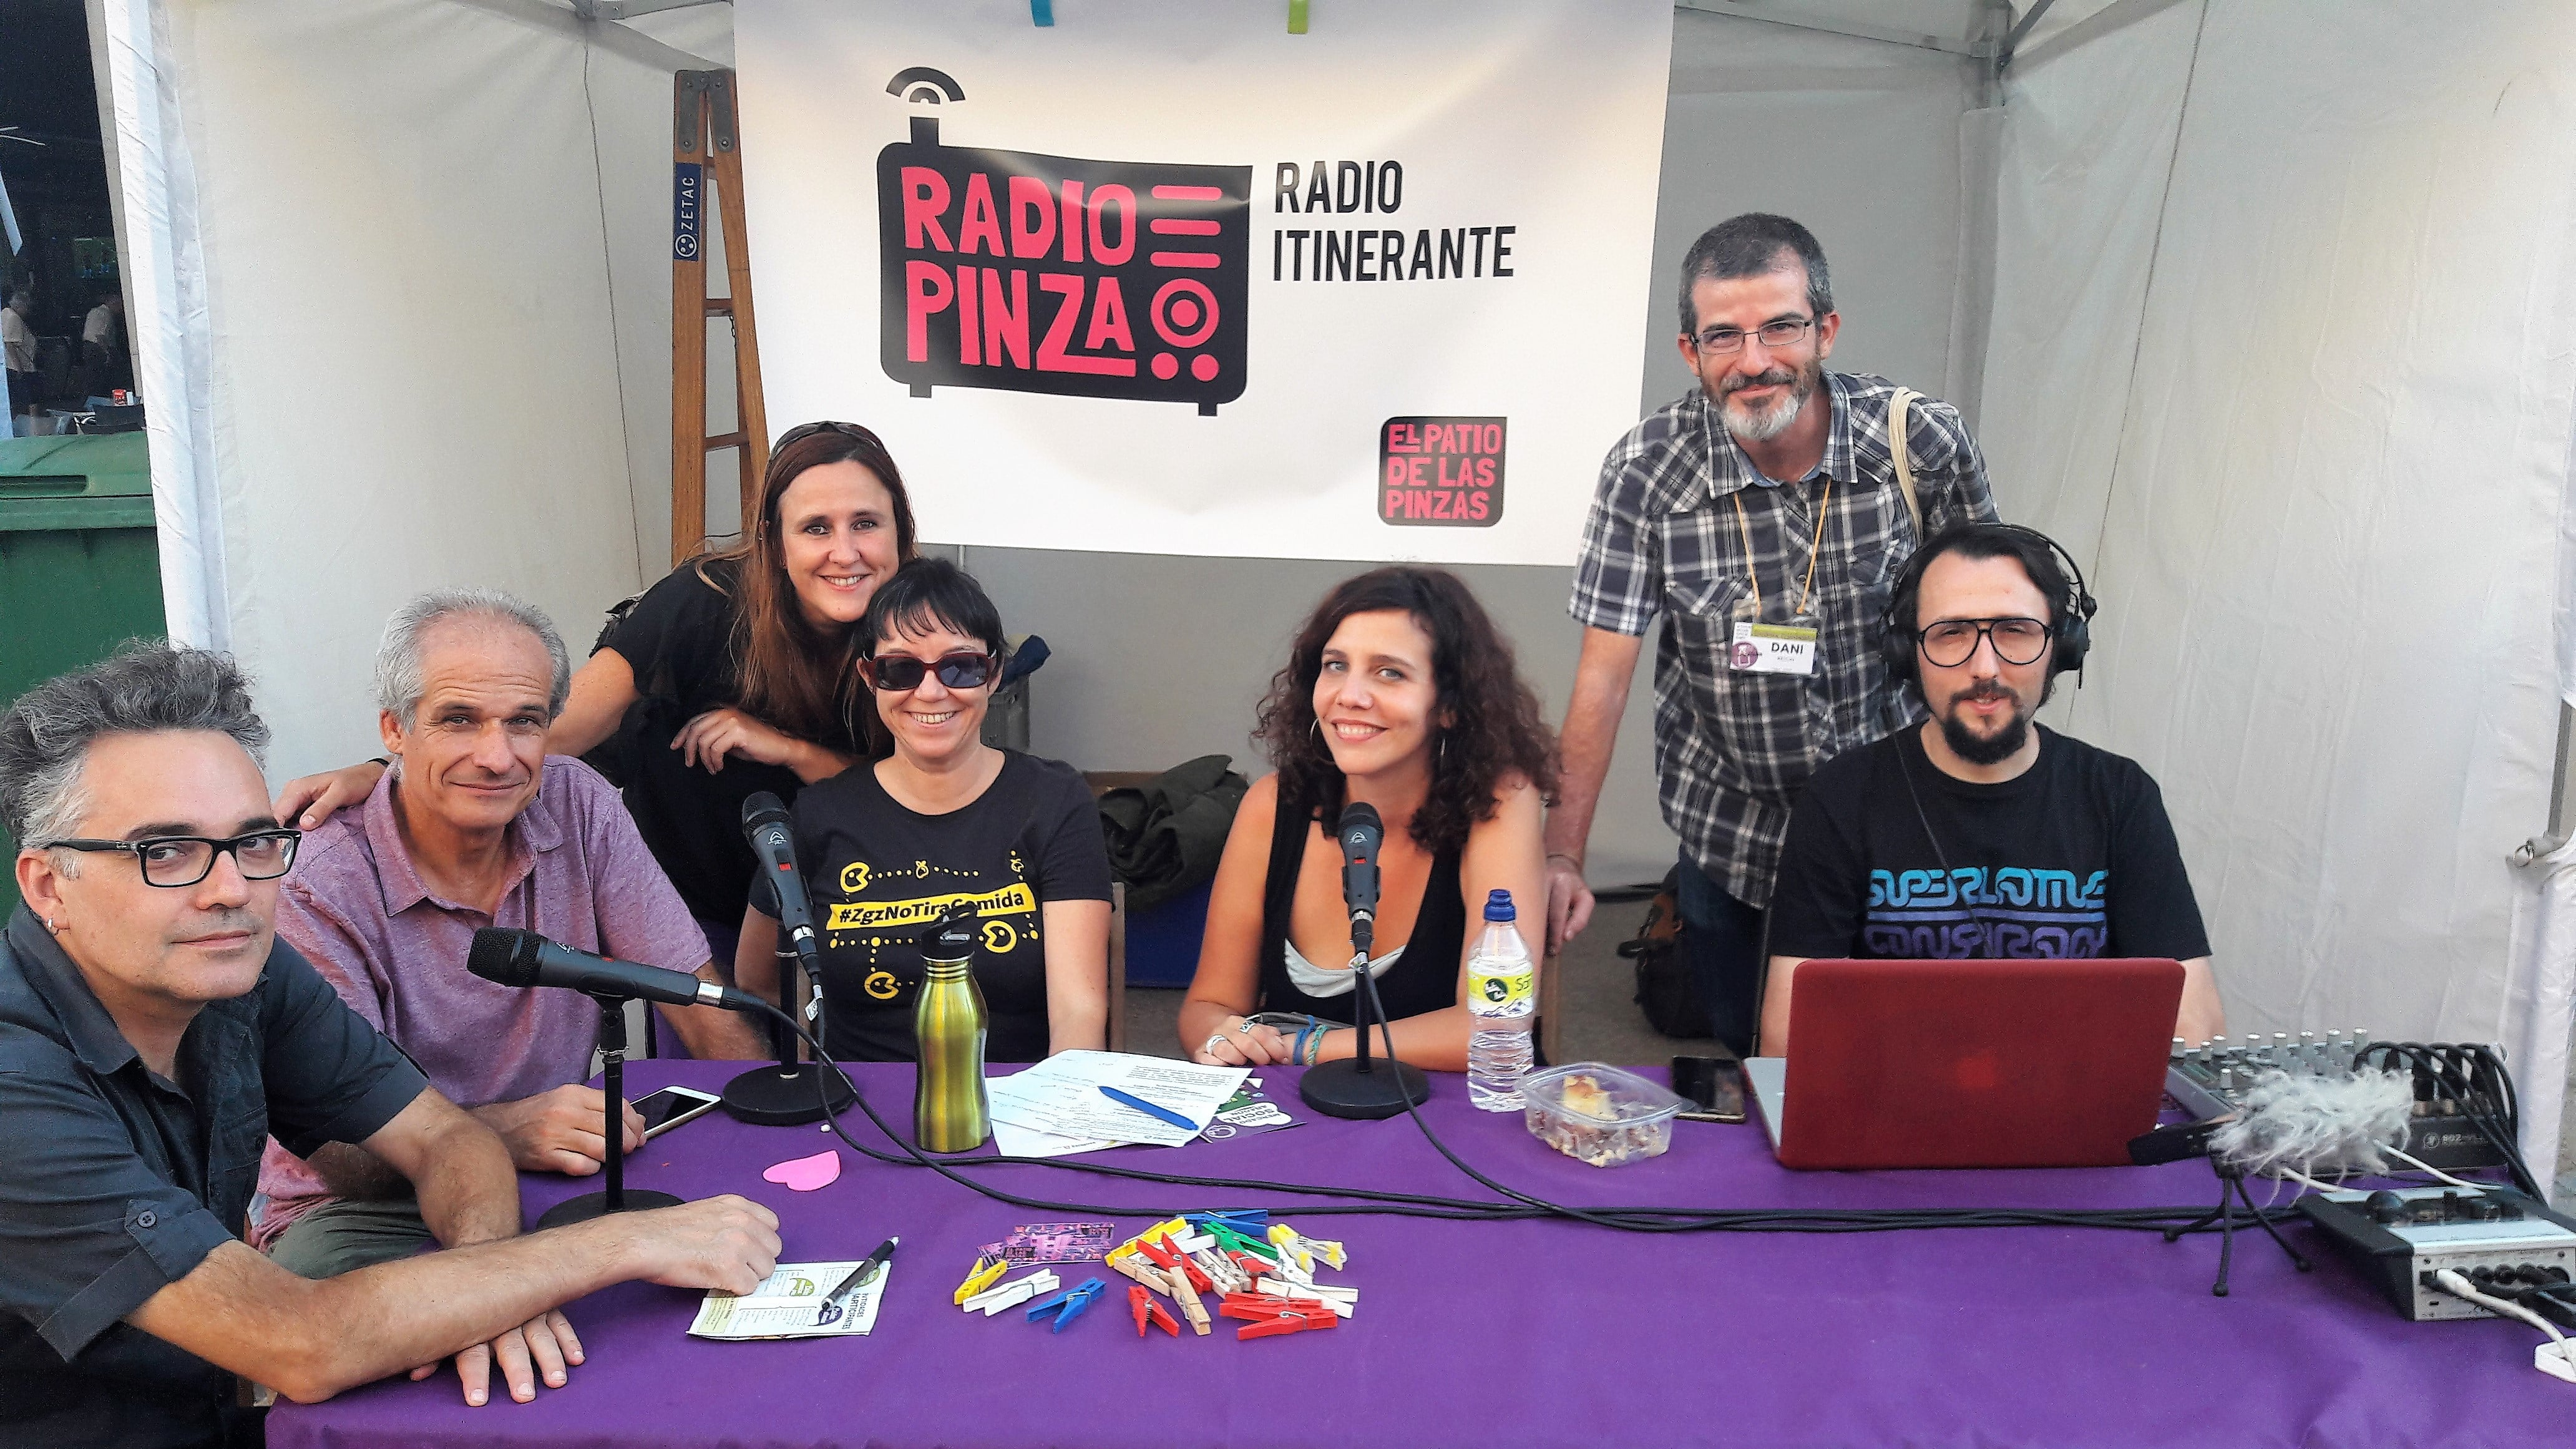 RADIO ITINERANTE